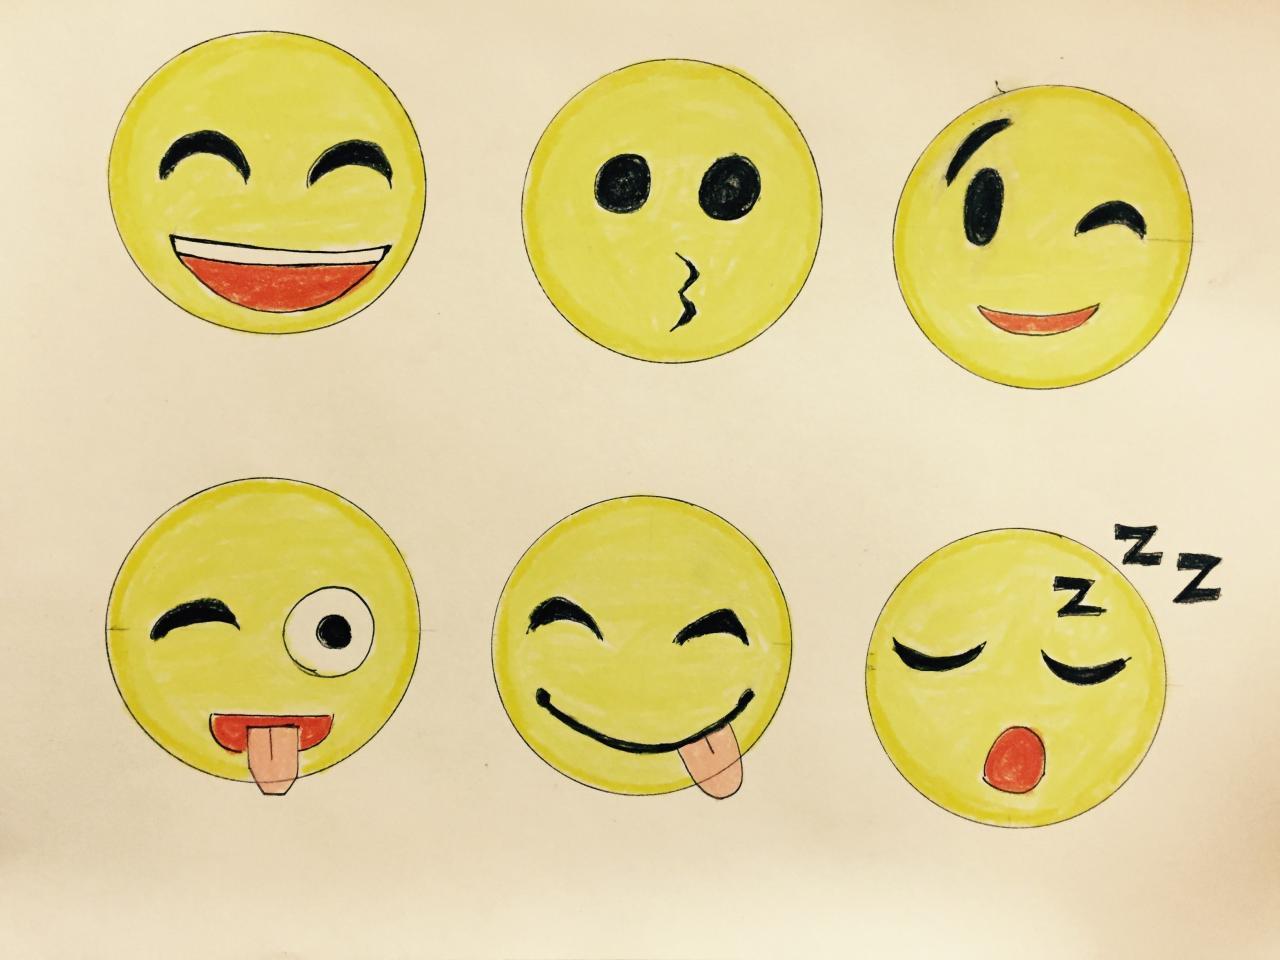 Manera de dibujar caras emojis